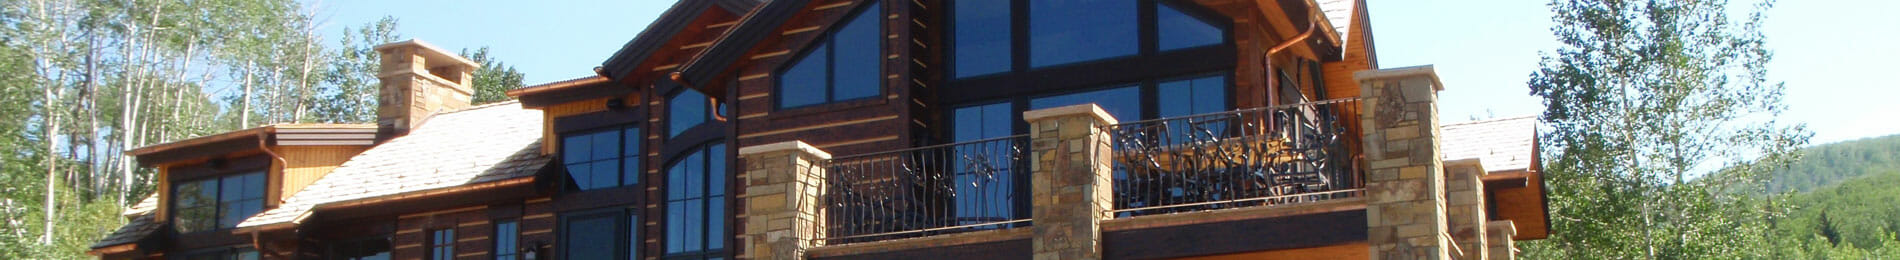 Aspen Renevation by Skywalker Construction in Durango CO